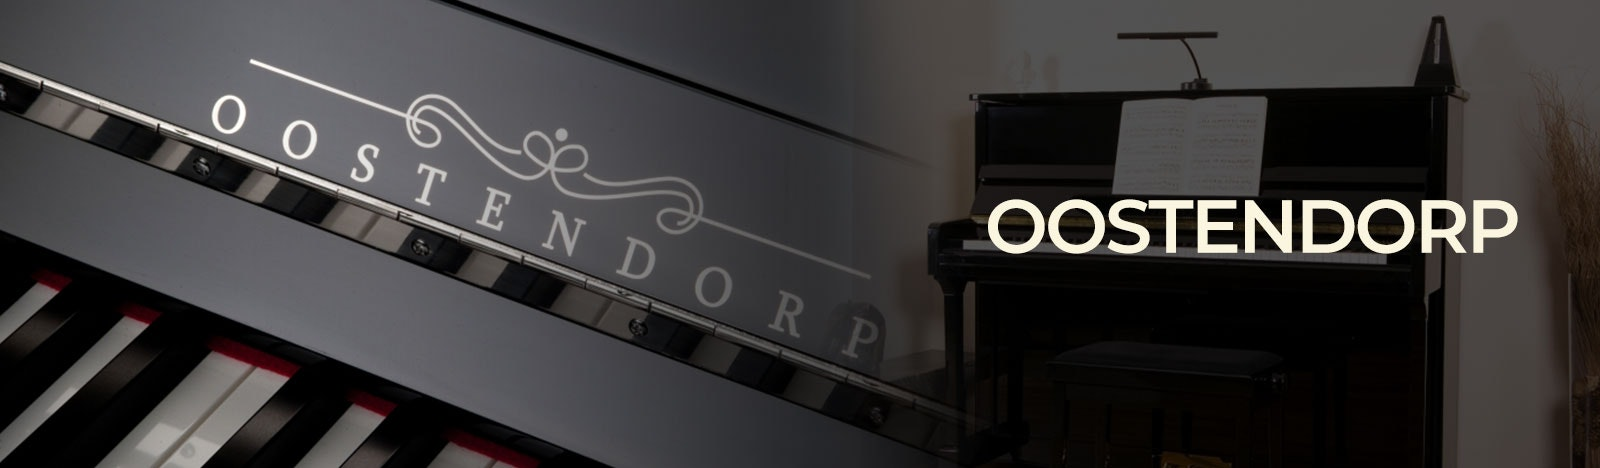 Oostendorp digitale piano